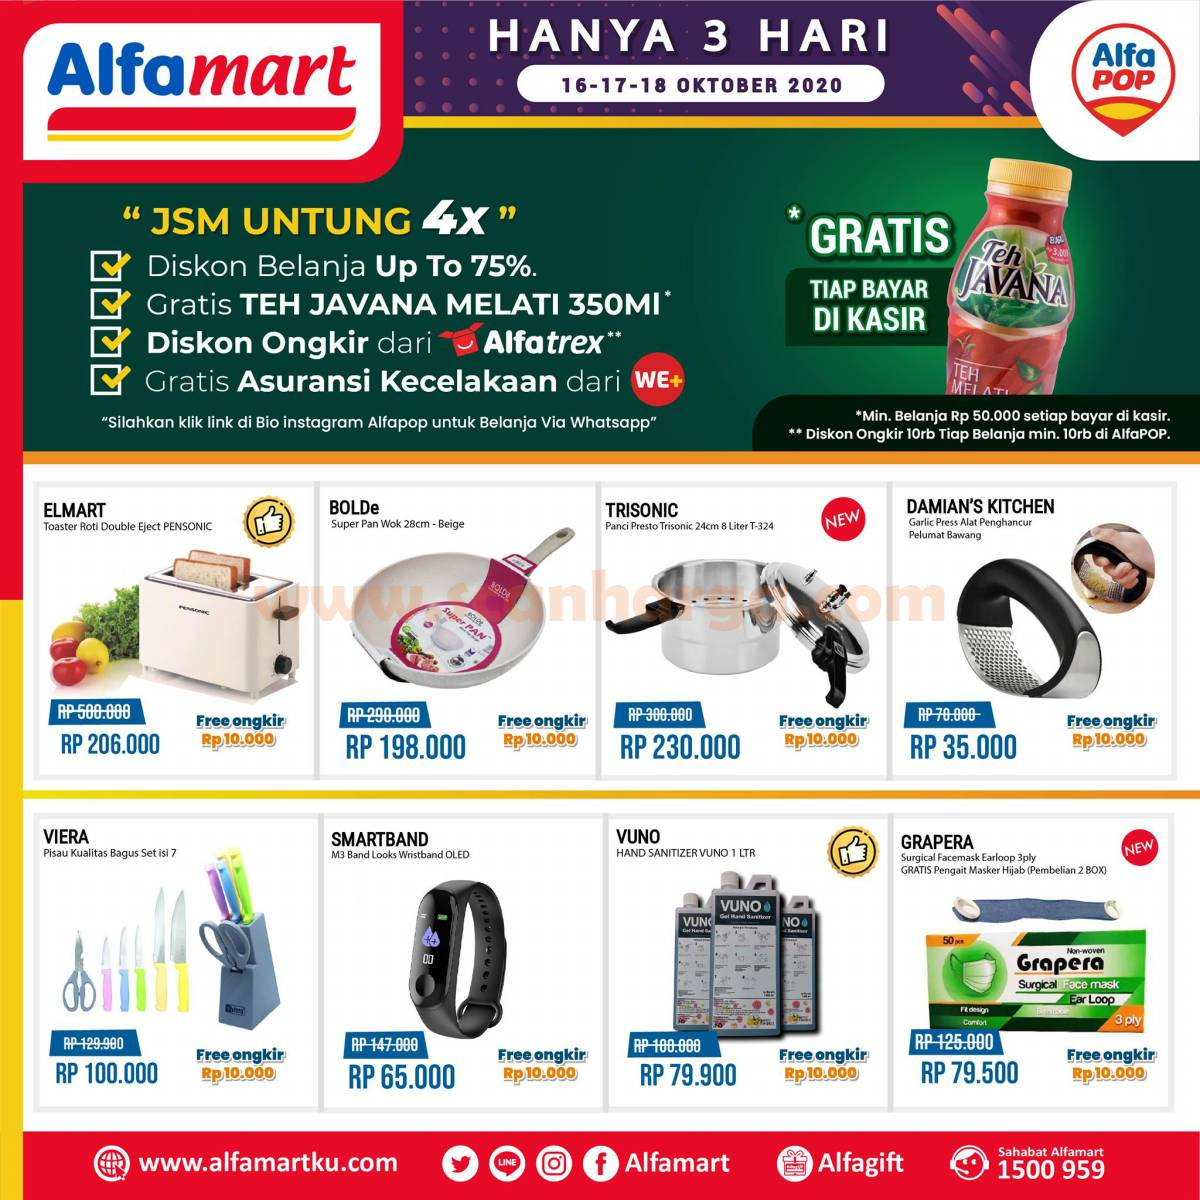 Alfamart Promo Jsm Alfapop 3 Hari 16 - 18 Oktober 2020